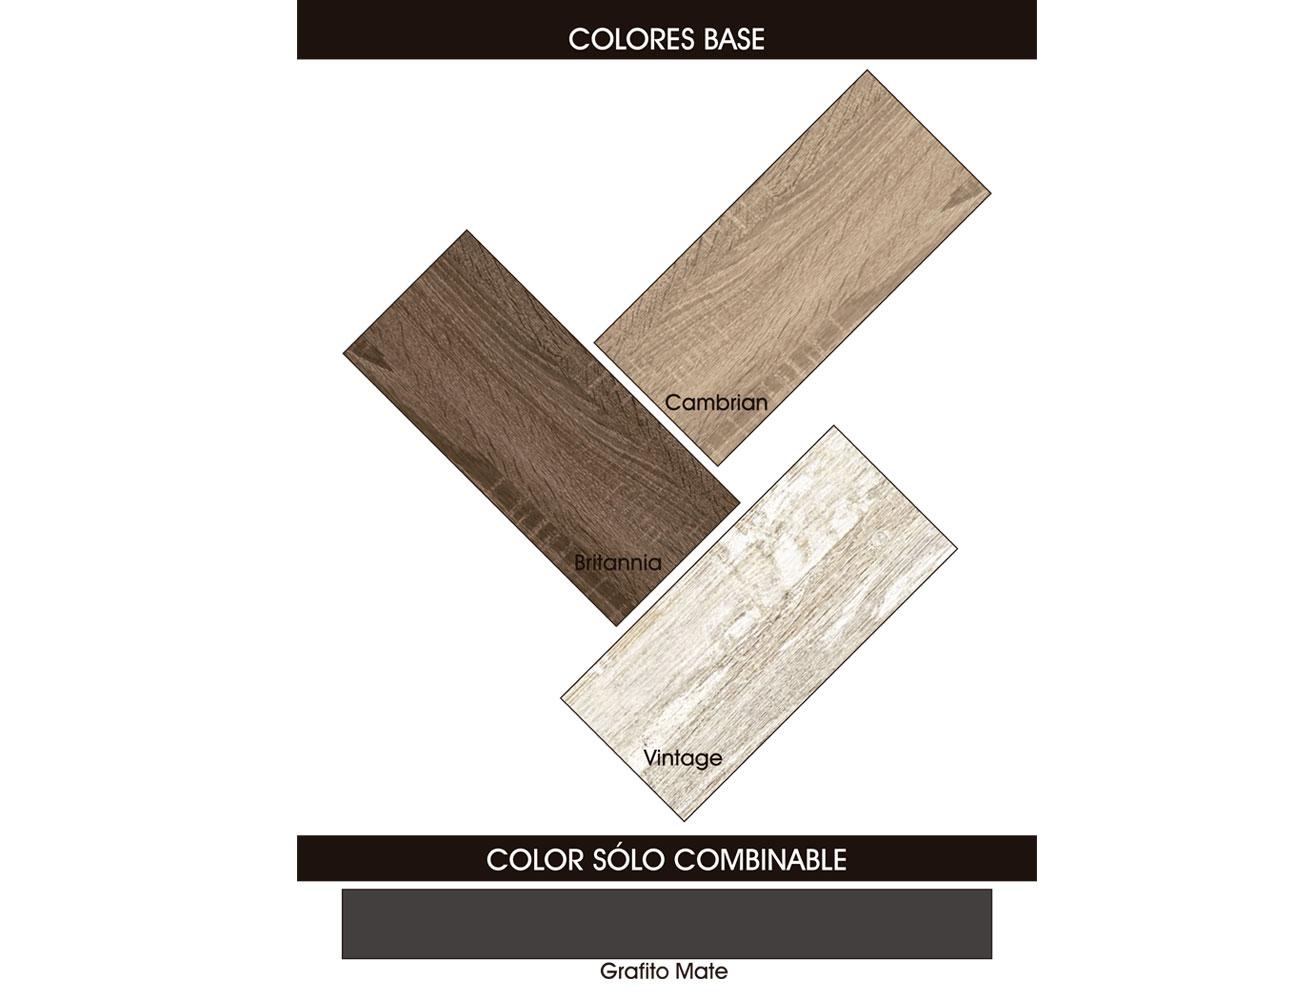 Colores 232